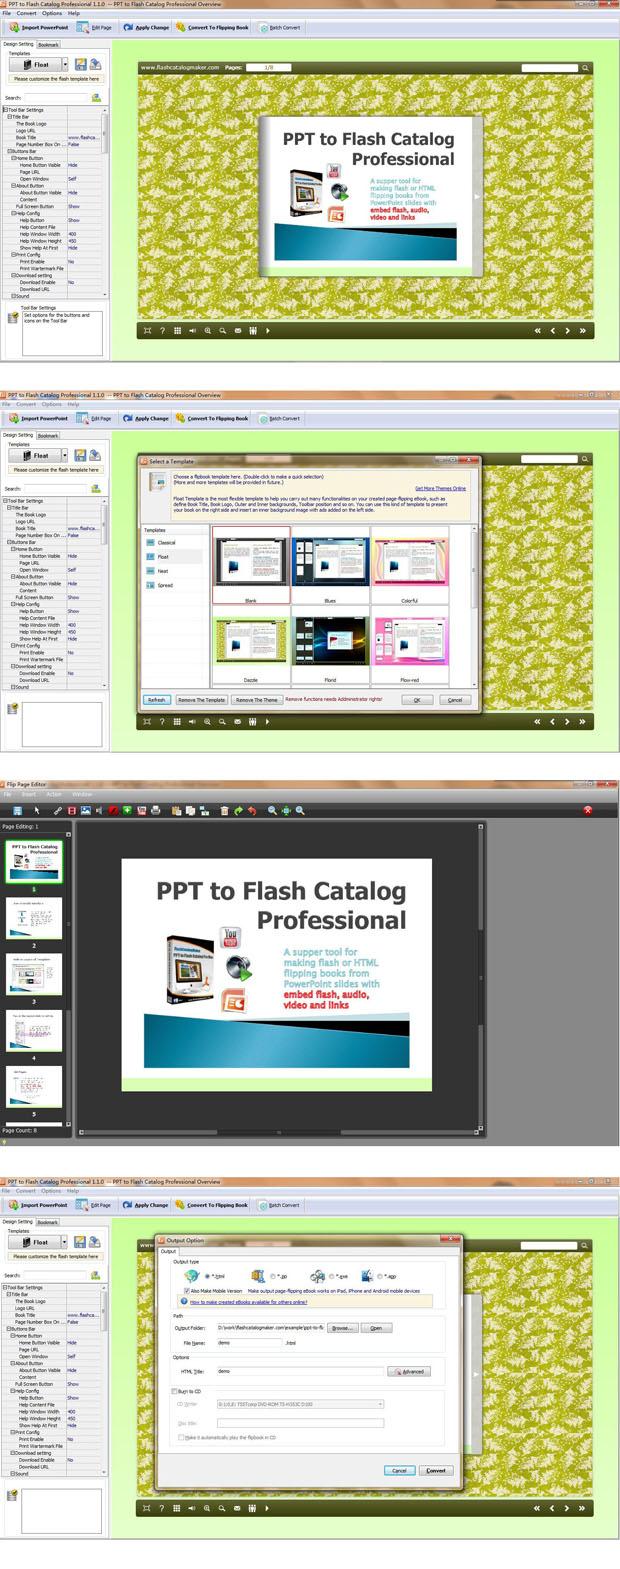 PPT to Flash Catalog Pro 1.8.6 full